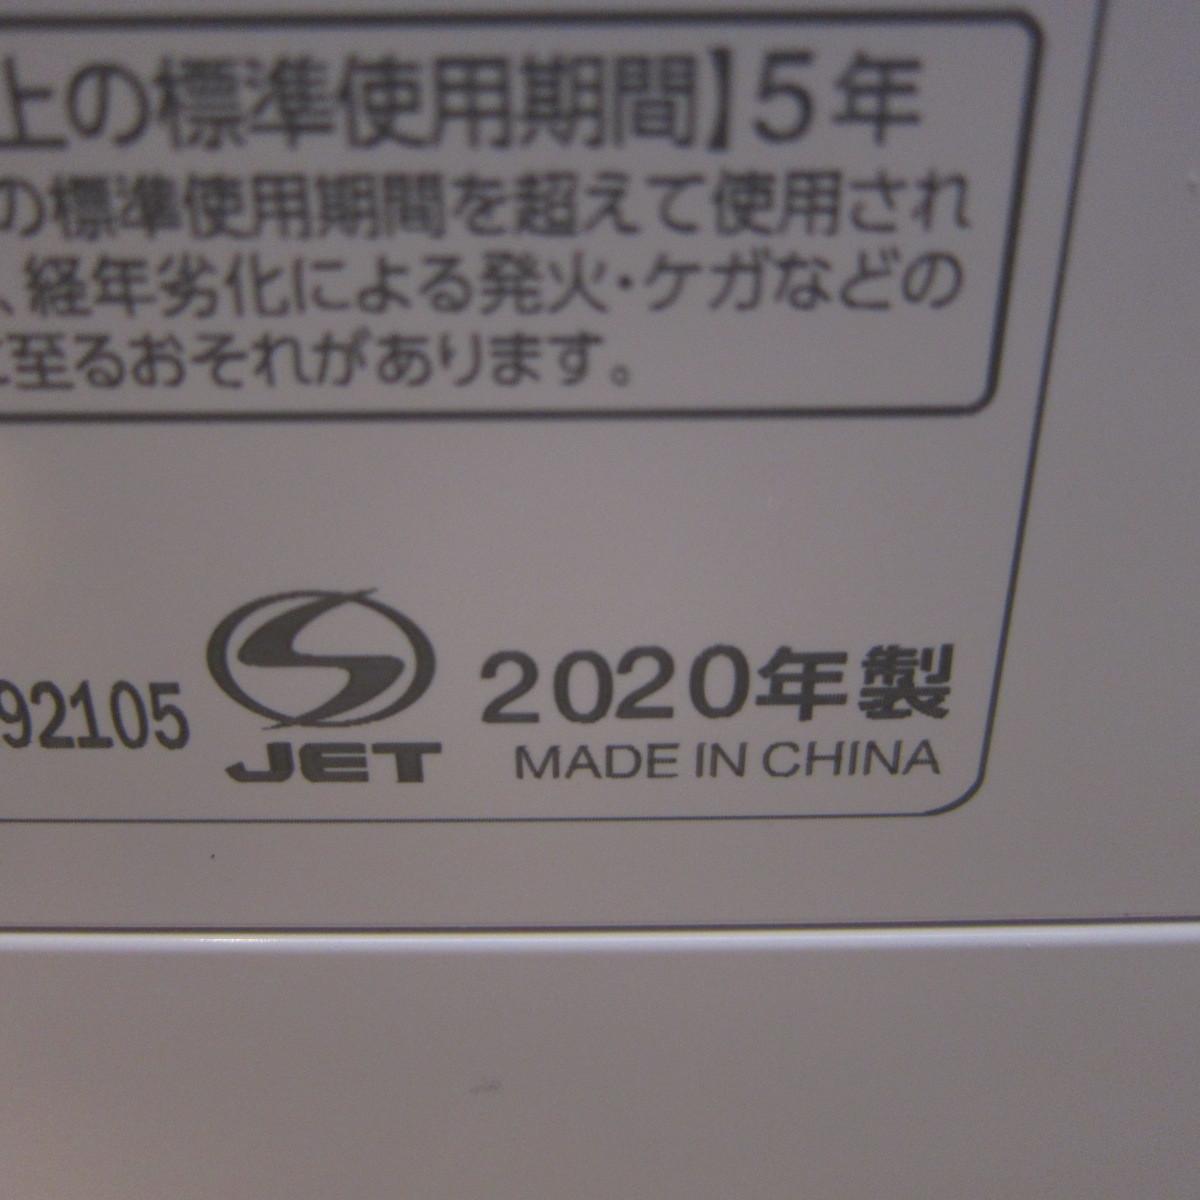 S6081【未使用】アイリスオーヤマ 衣類乾燥除湿機 スピード乾燥 サーキュレーター機能付 デシカント式 ホワイト IJD-I50_画像5